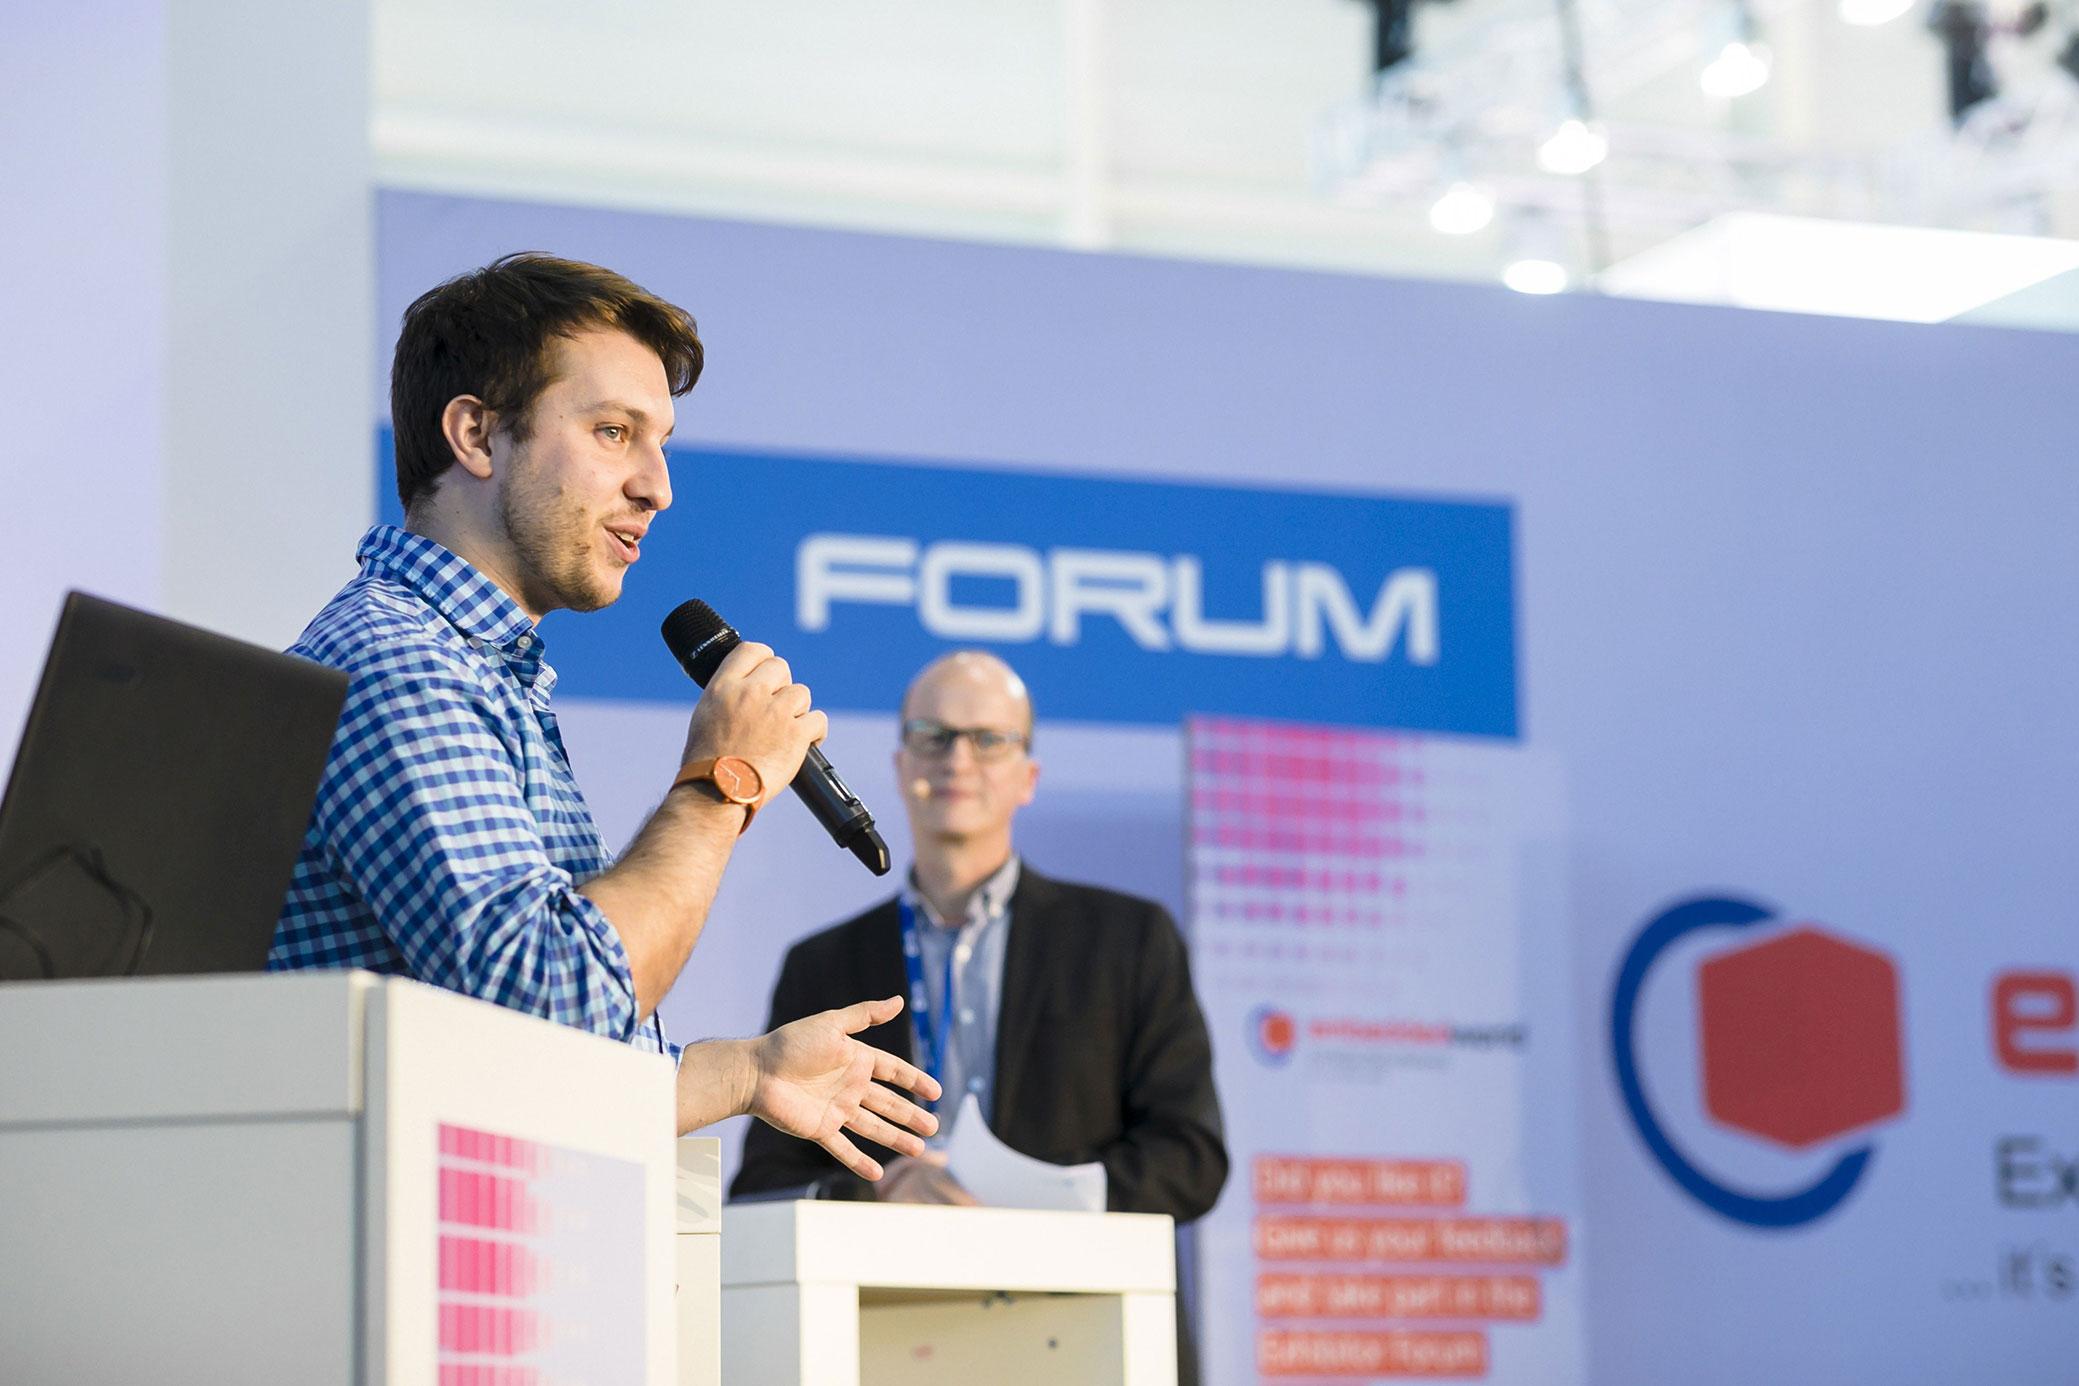 Start-up Presentations